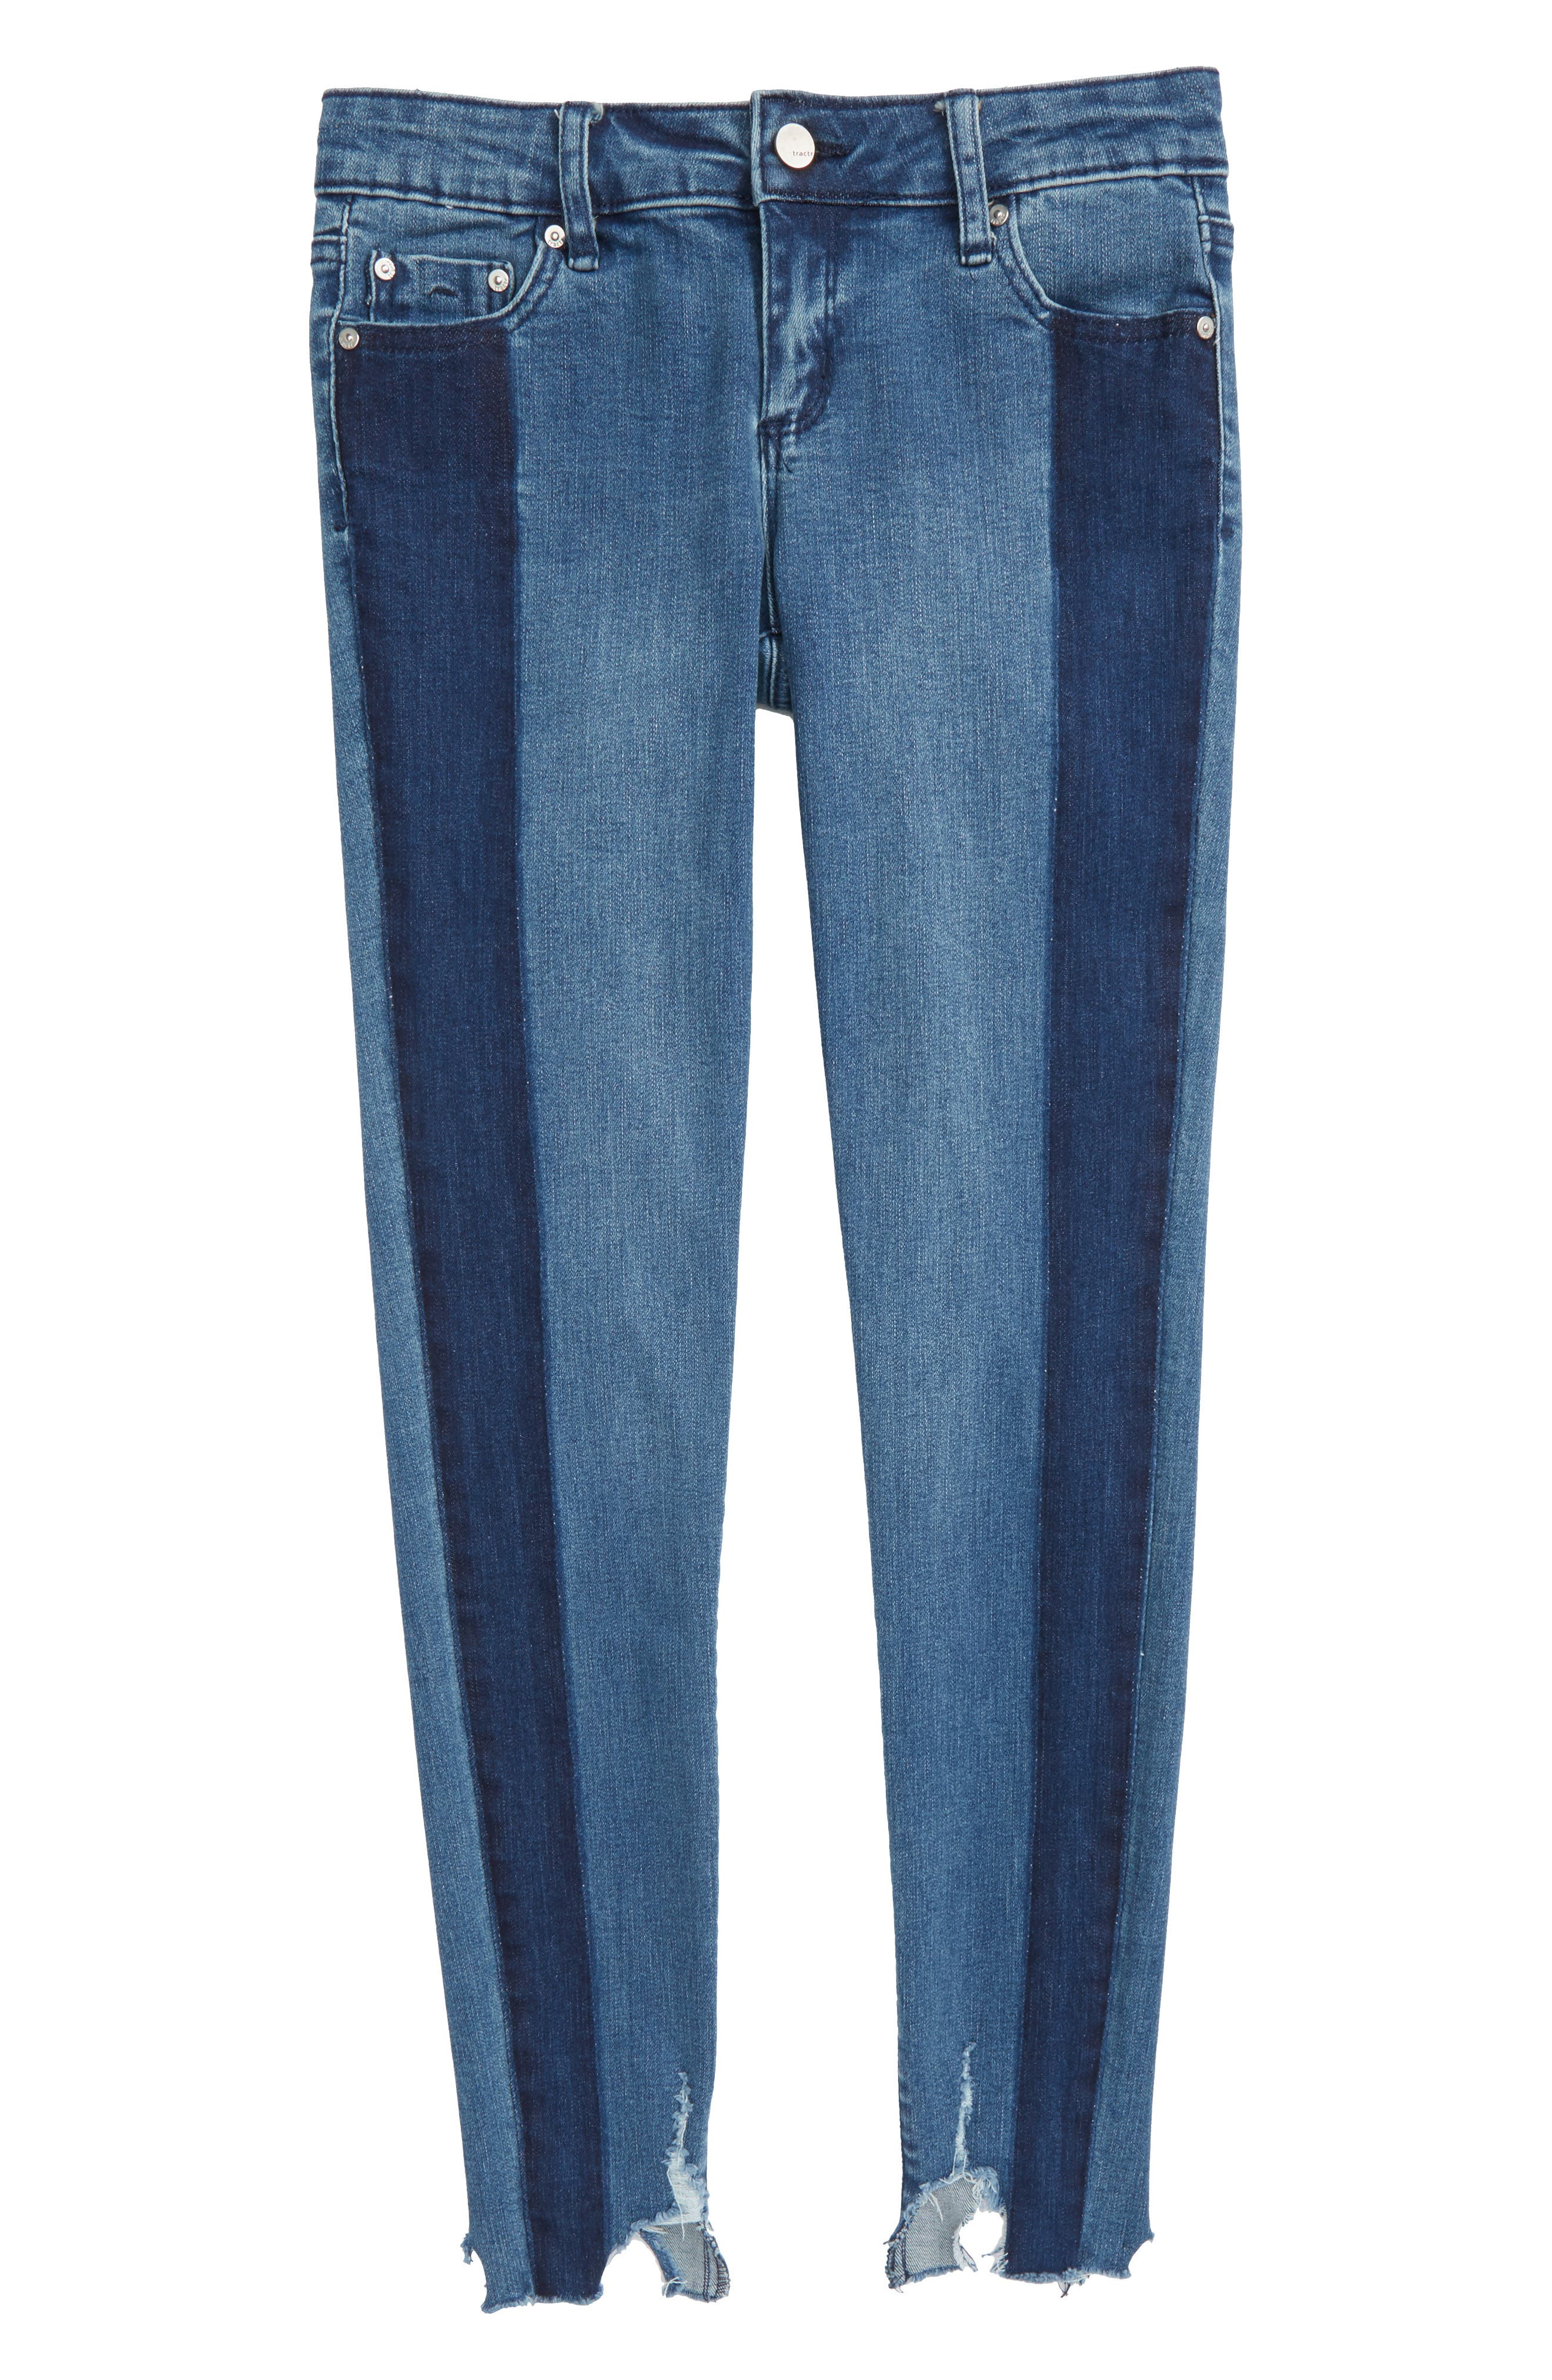 Tractr Crop Skinny Jeans (Big Girls)